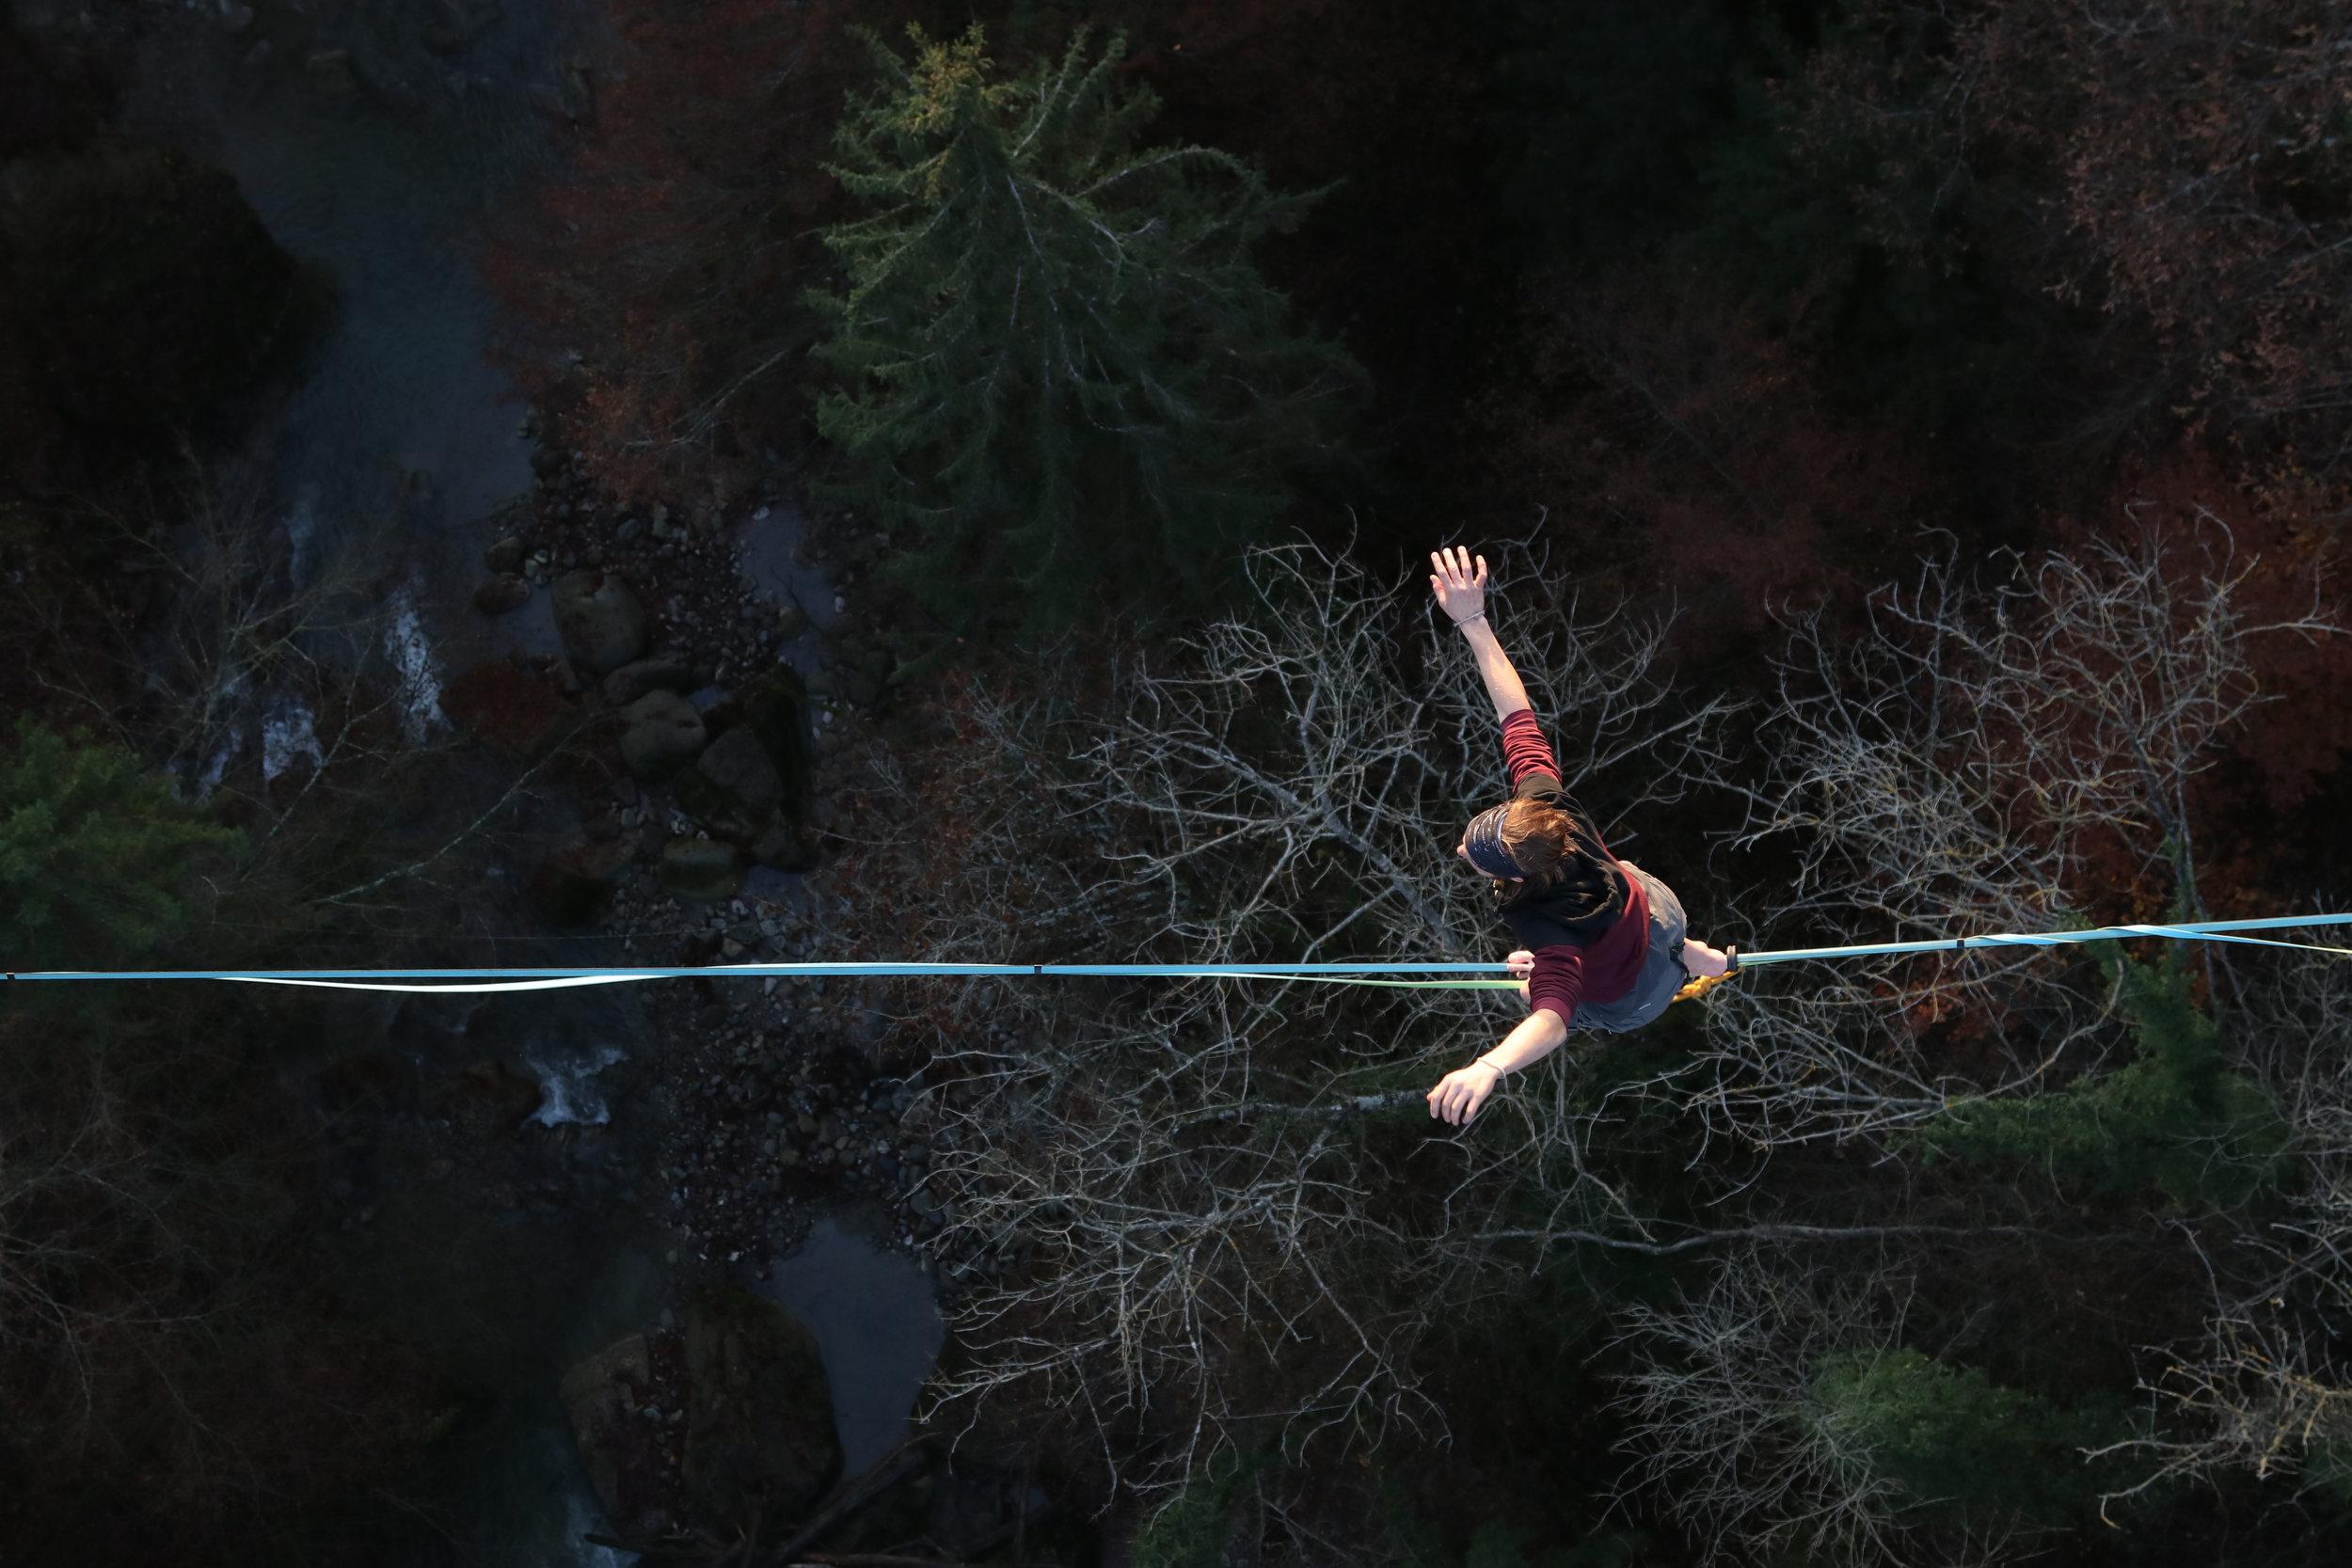 Pont de Fenil, Vevey, Suisse, circus workshop atelier taller ecole school suisse schweiz switzerland Slackline Lyell Grunberg show performance spectacle Highline trickline (6).JPG